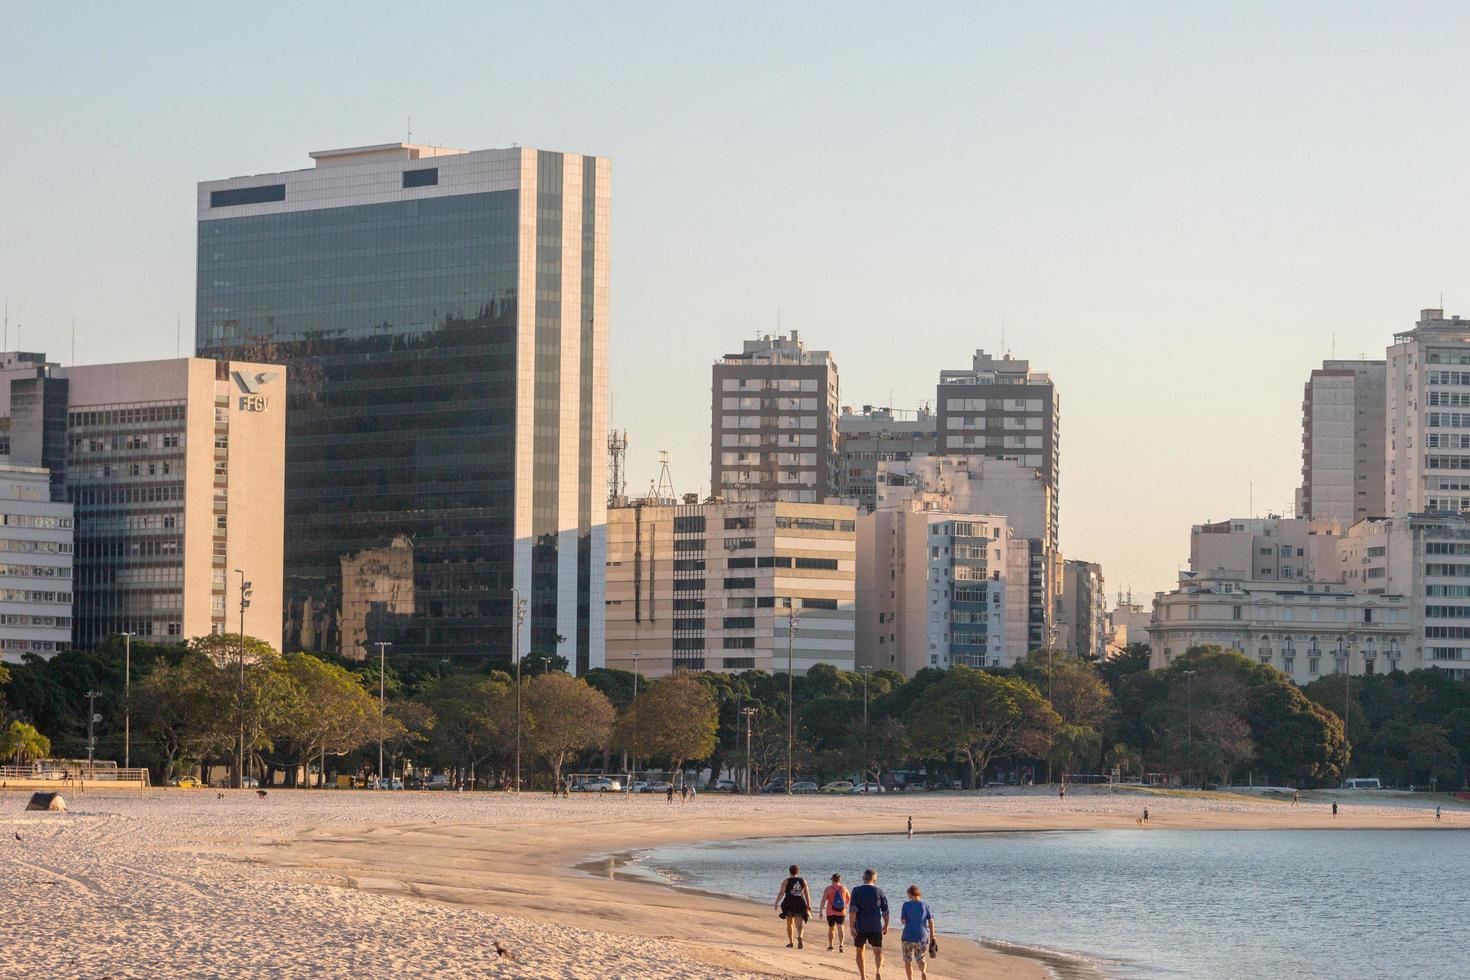 río de janeiro, brasil, 2015 - vista a la playa de botafogo foto